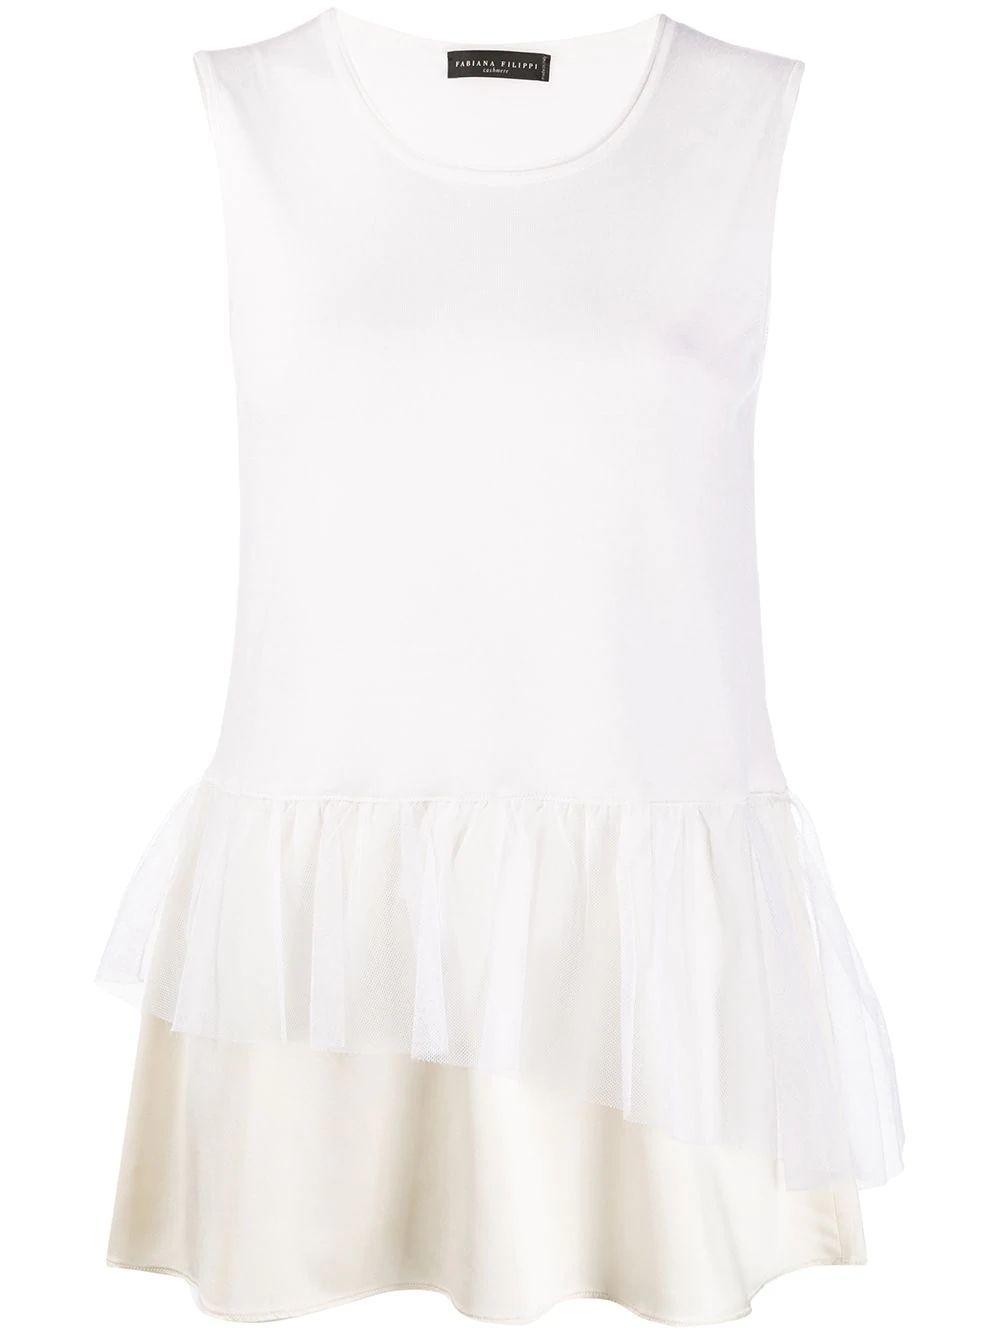 Sleeveless Cashmere Silk Top With Satin Item # MAD260B939